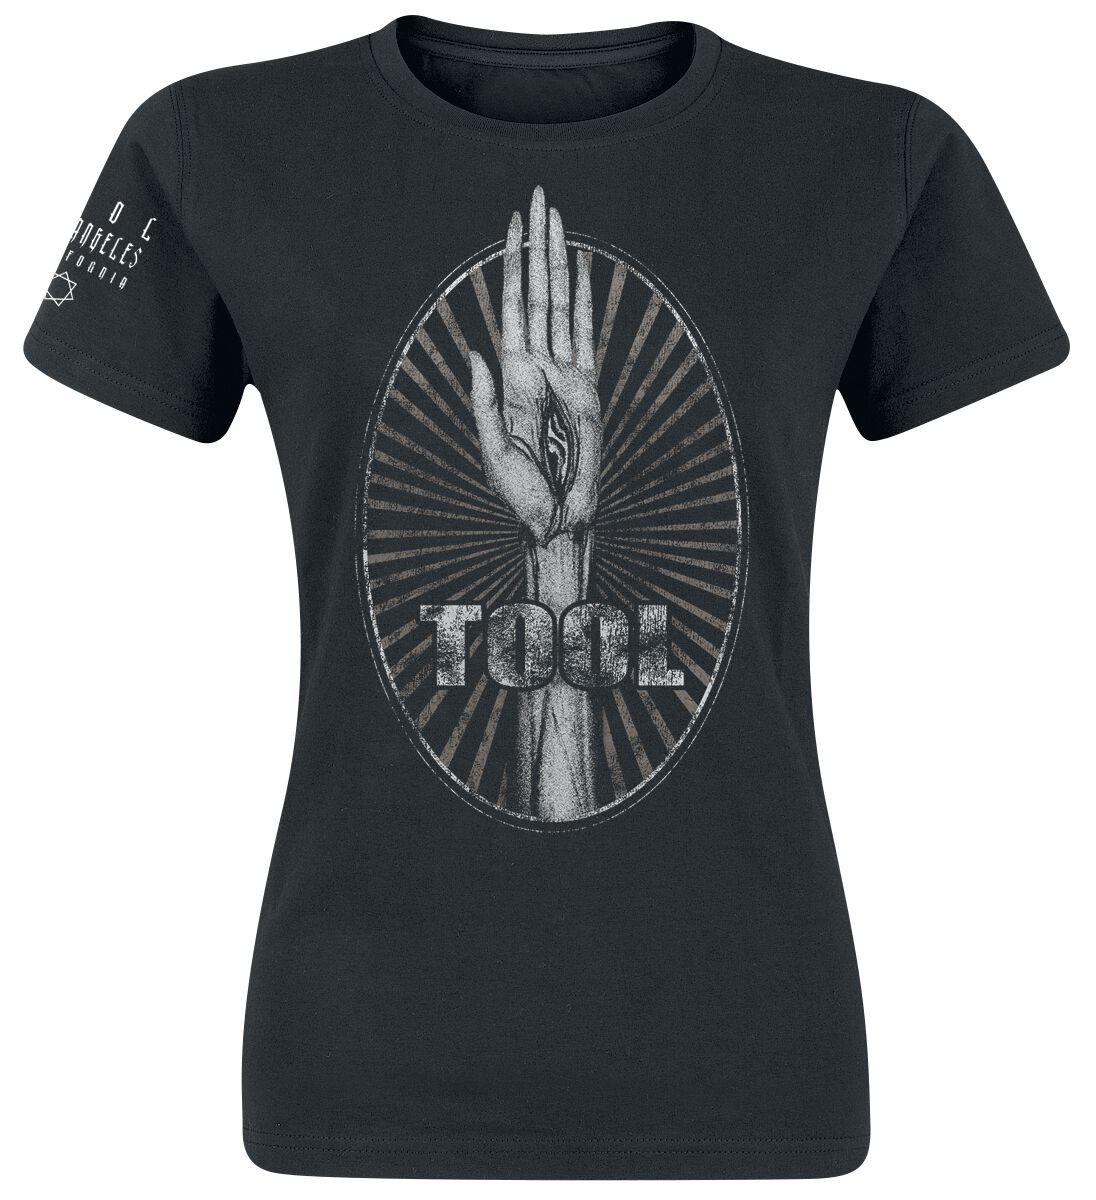 Zespoły - Koszulki - Koszulka damska Tool Eye In Hand Koszulka damska czarny - 356556